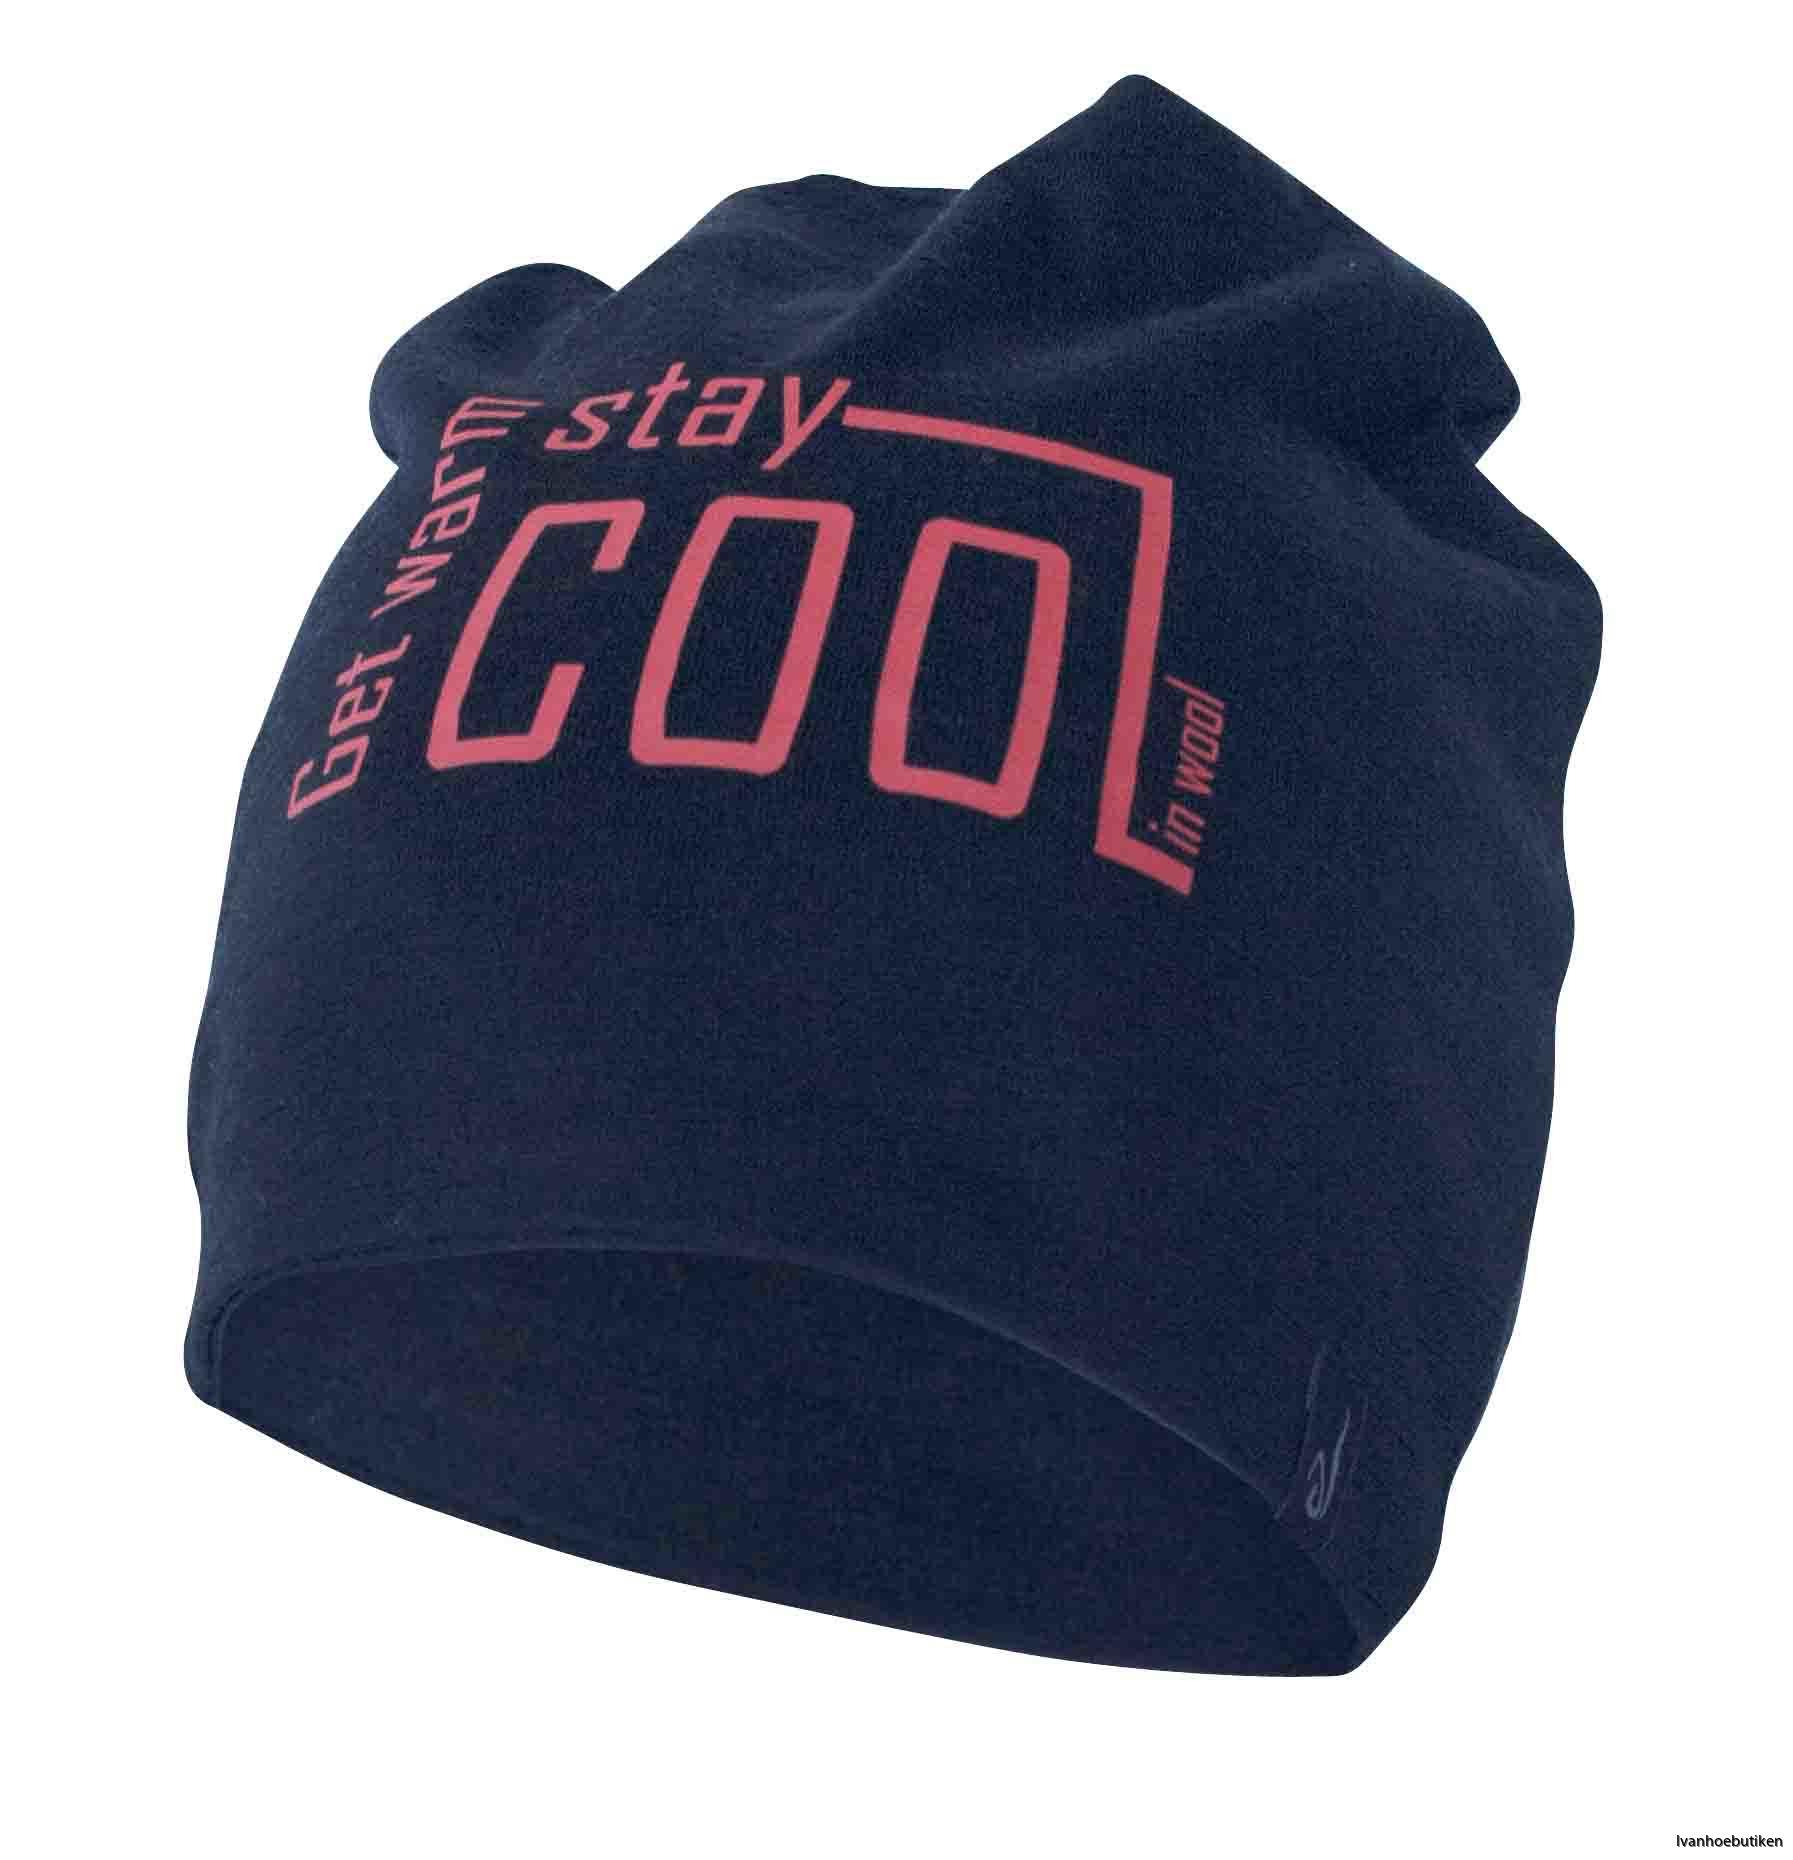 UW_Hat_Stay_Cool_015